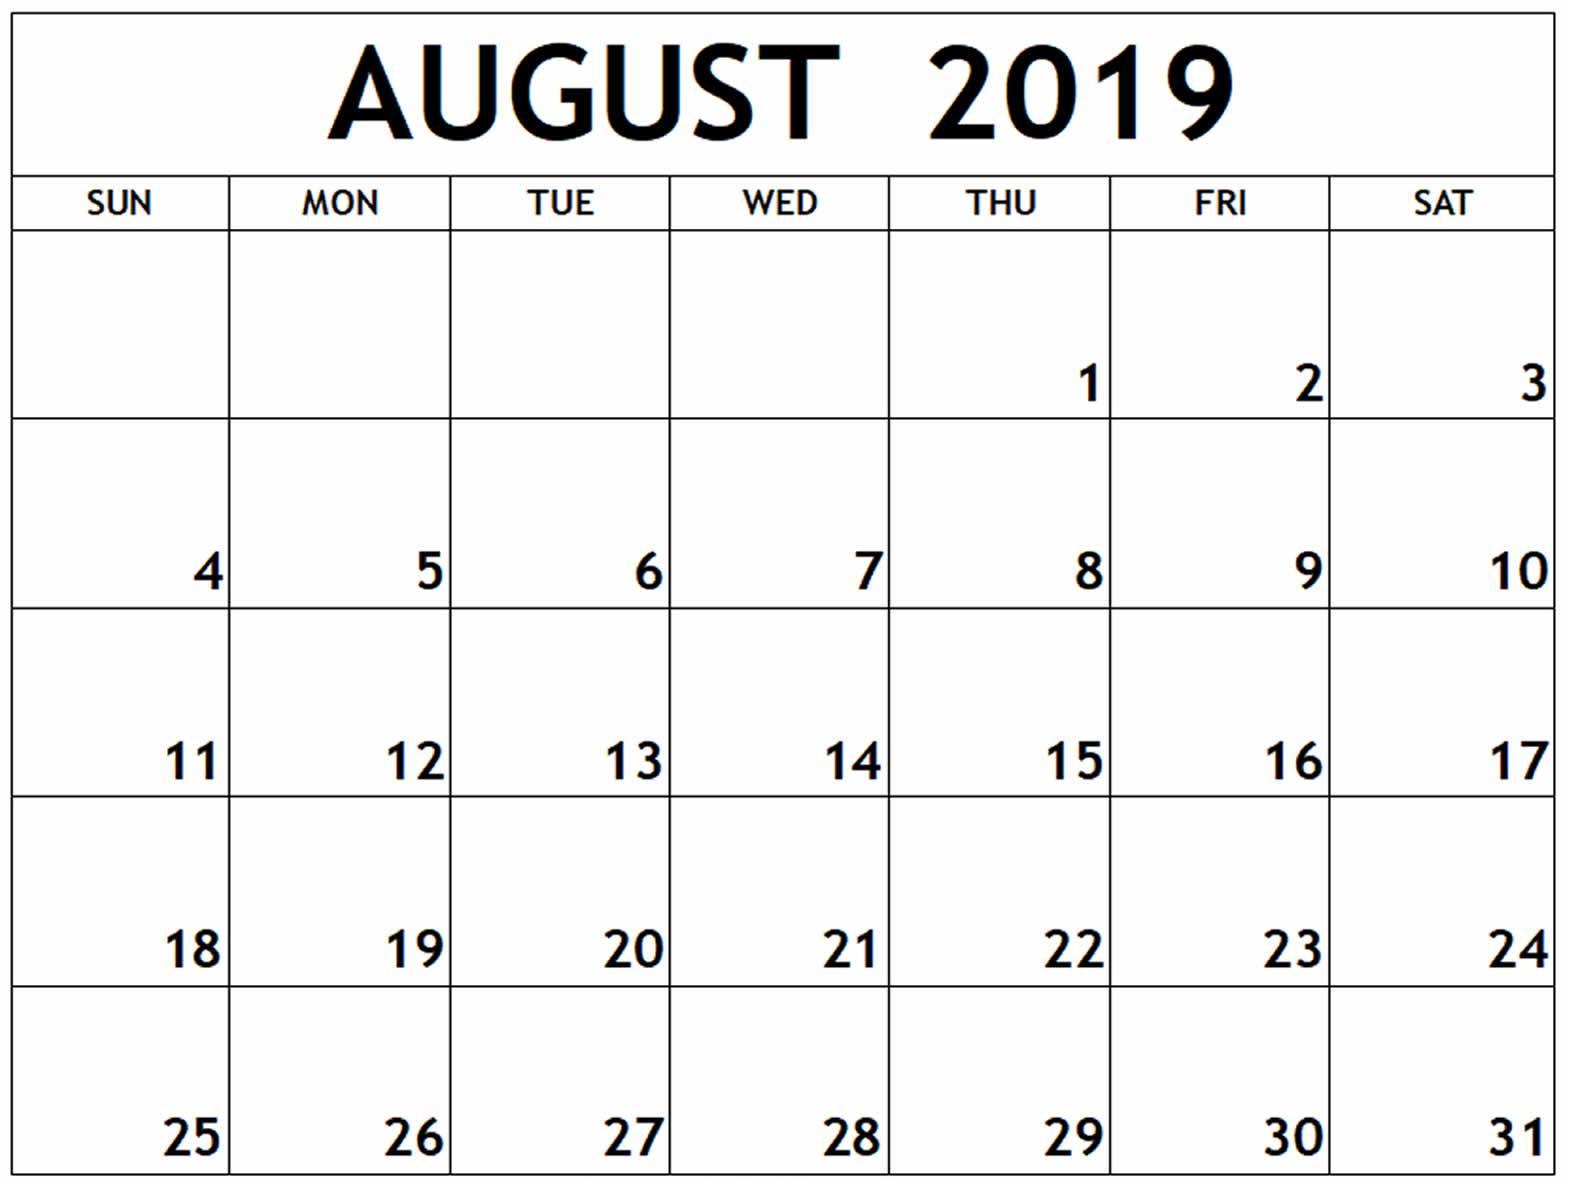 August 2019 Calendar Printable - Free August 2019 Calendar Printable pertaining to August Calendar Template Printable